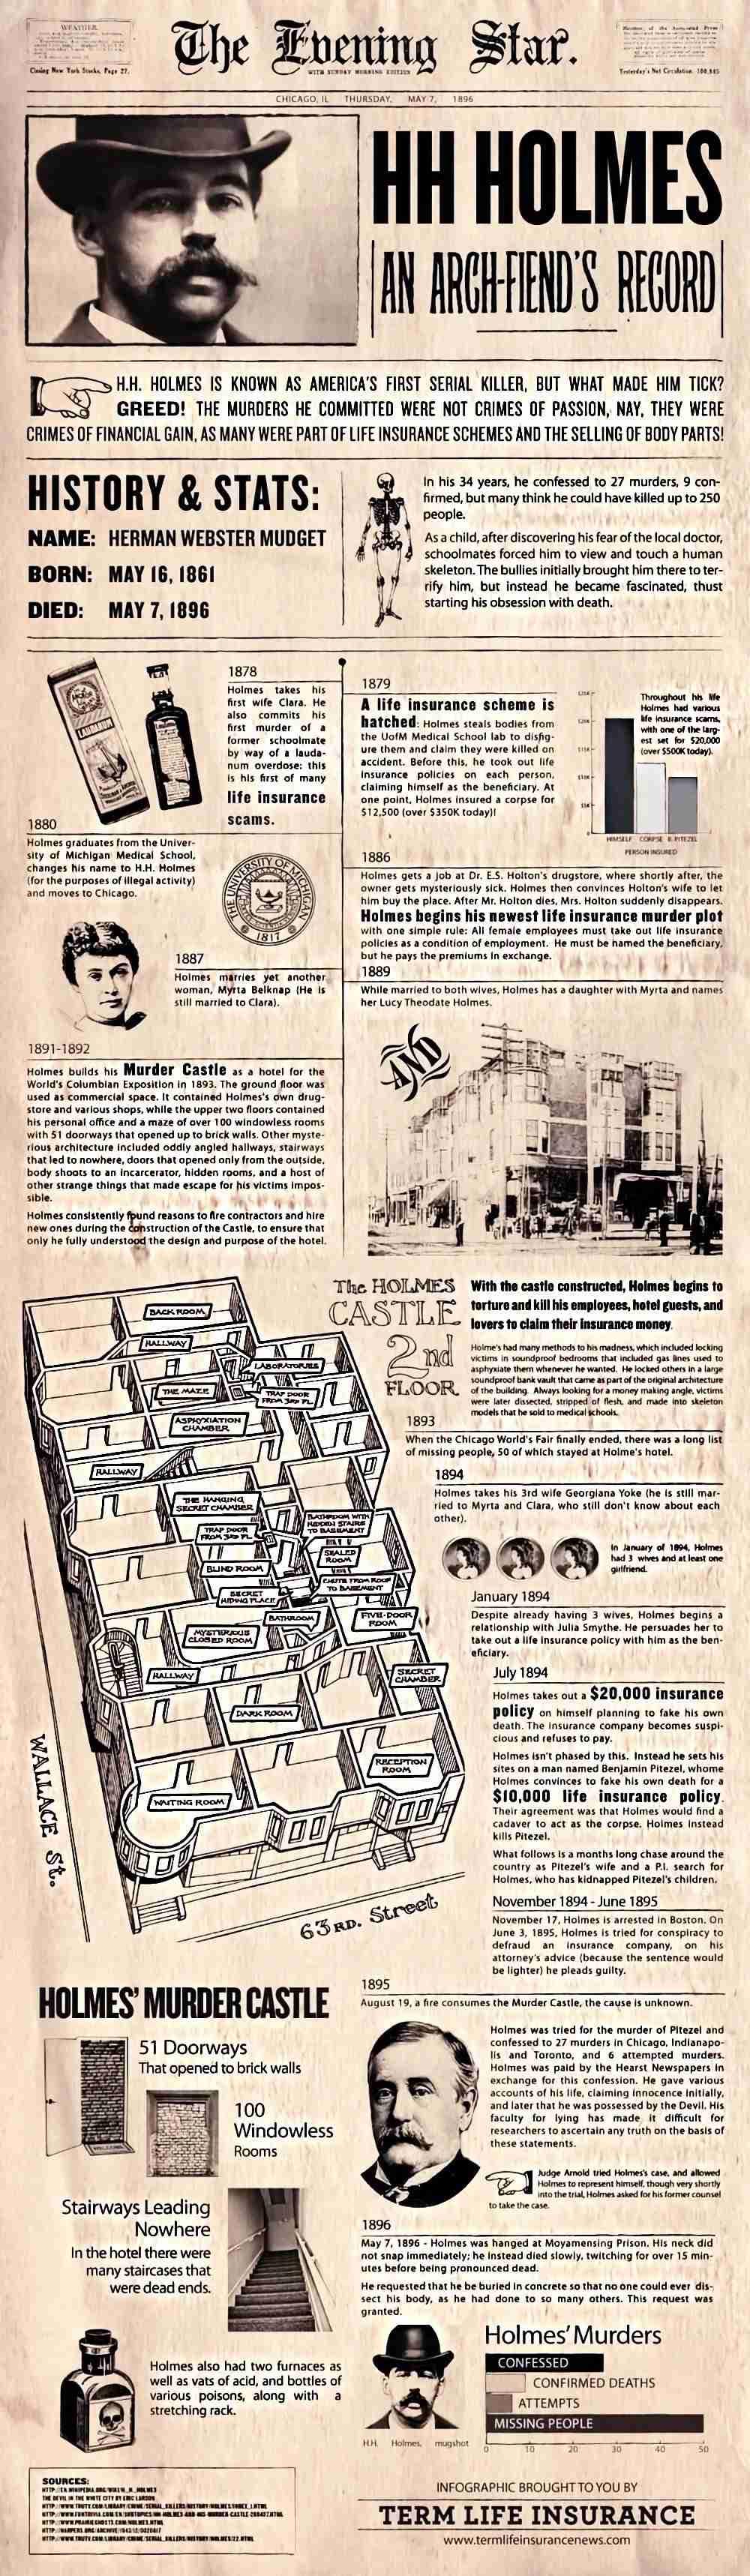 HH Holmes Murder Castle Infographic